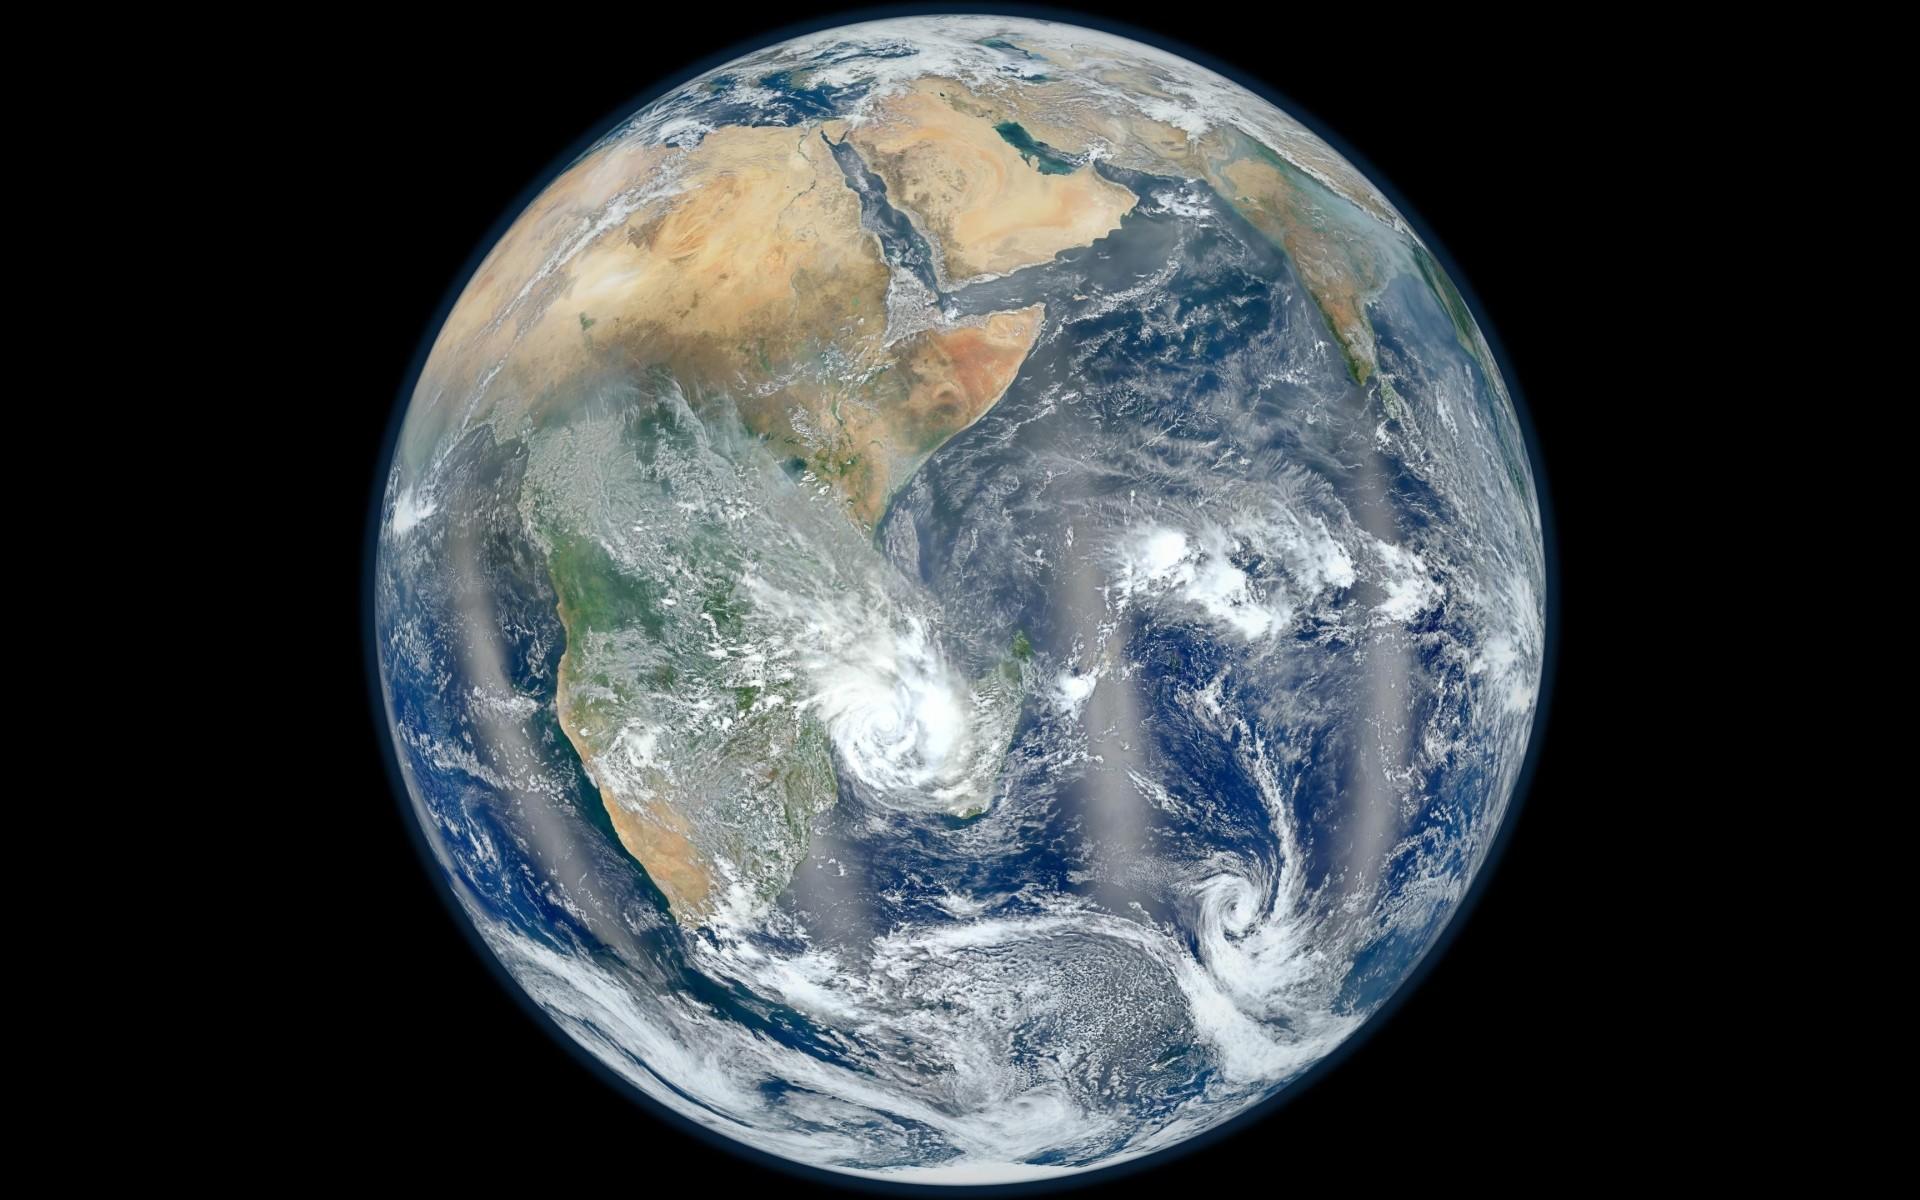 Desktop Wallpaper 178 – La Terra dallo spazio